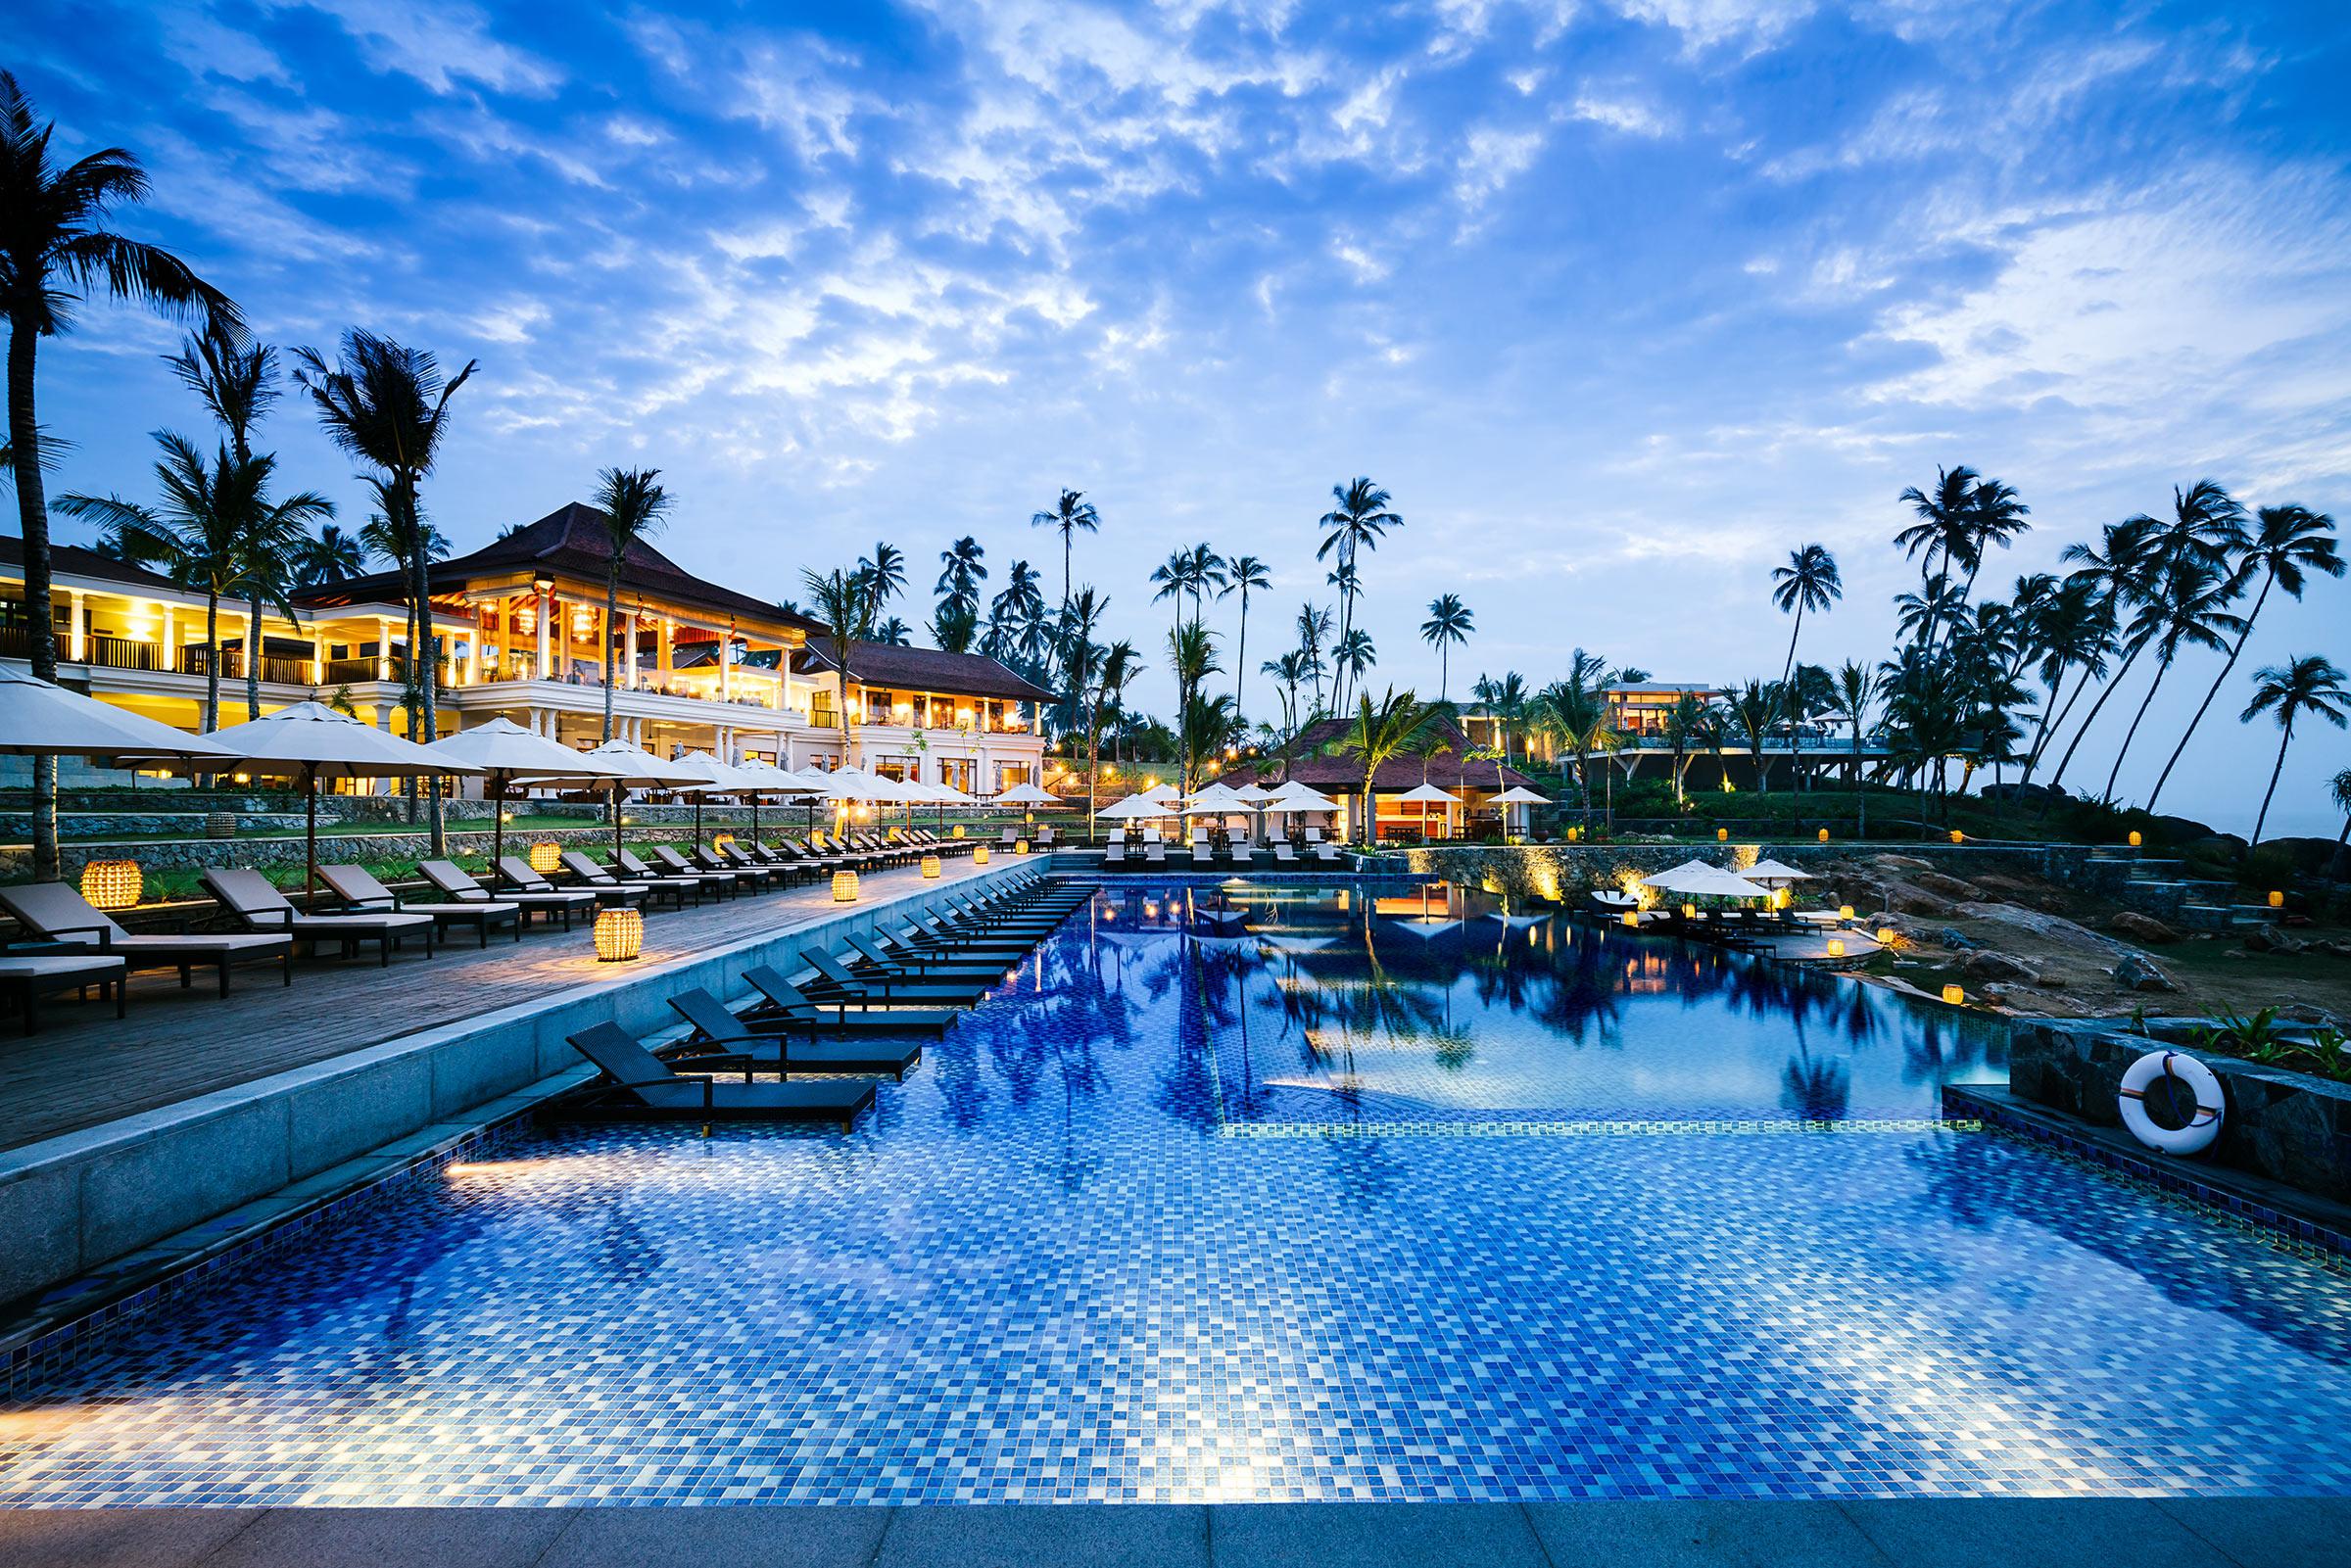 Anantara-Peace-Haven-Tangalle-Resort-Pool.jpg